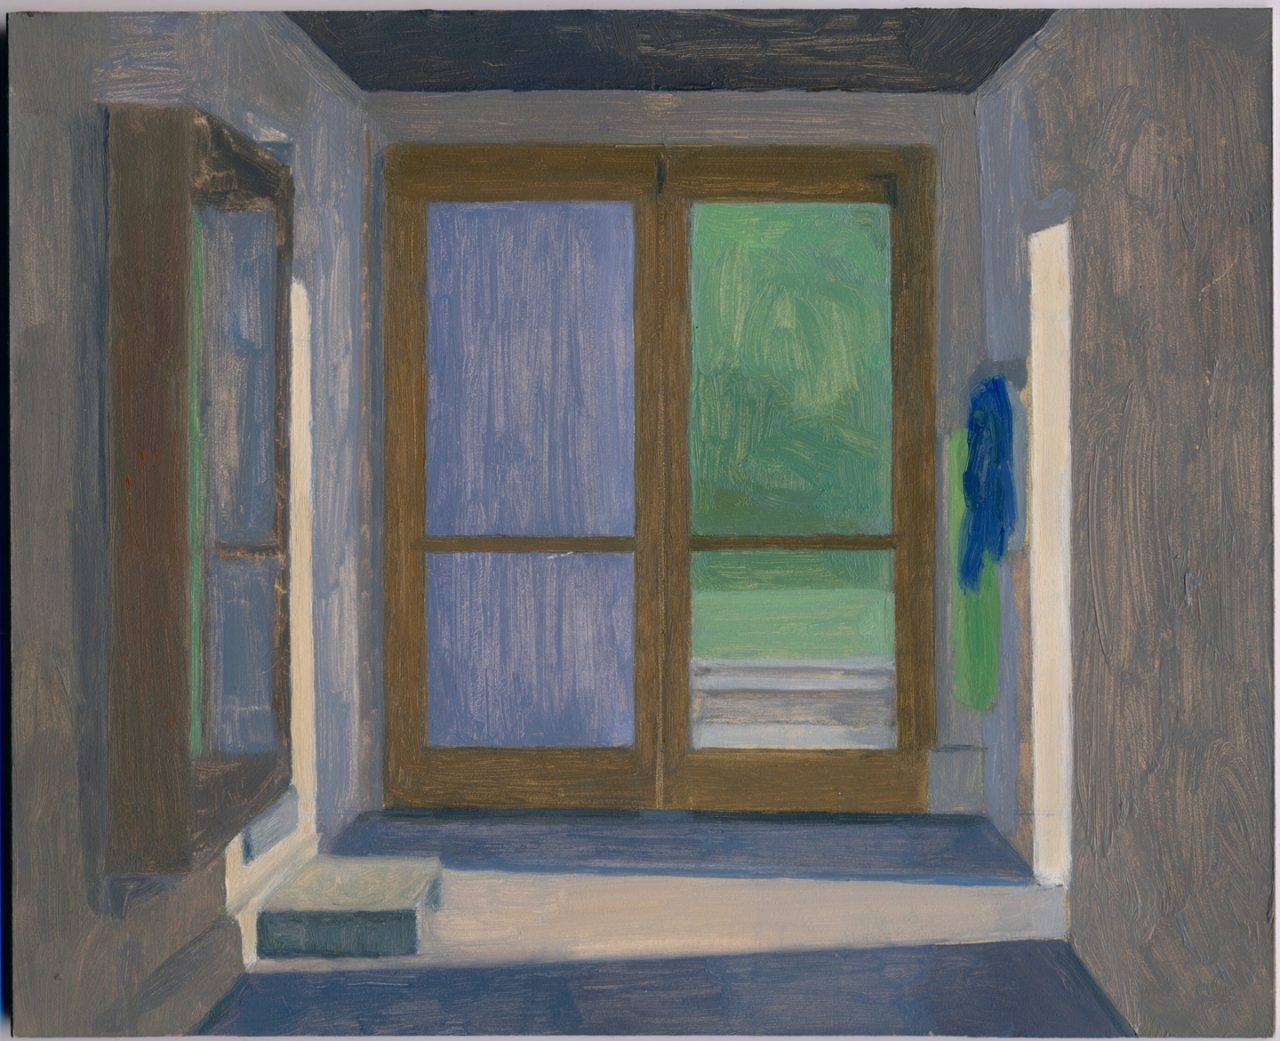 Eleanor Ray | Barn Hallway, Dusk, 2016